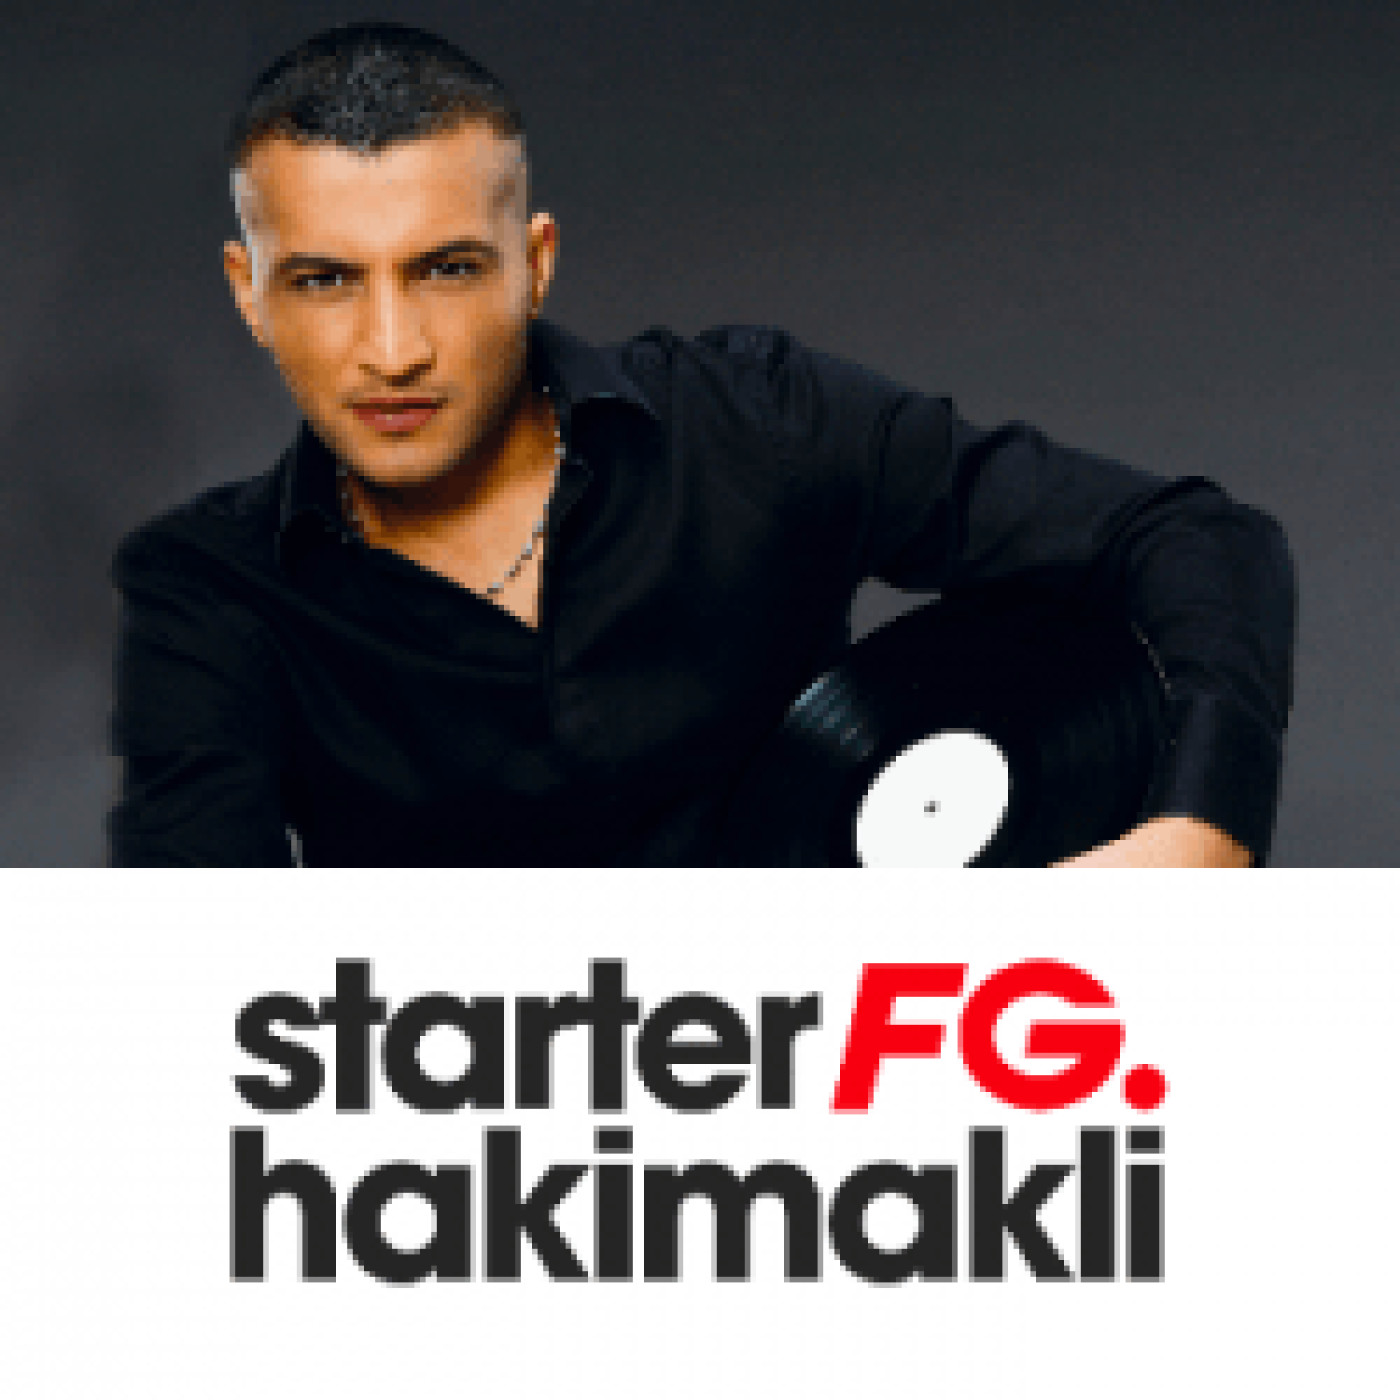 STARTER FG BY HAKIMAKLI MERCREDI 6 JANVIER 2021